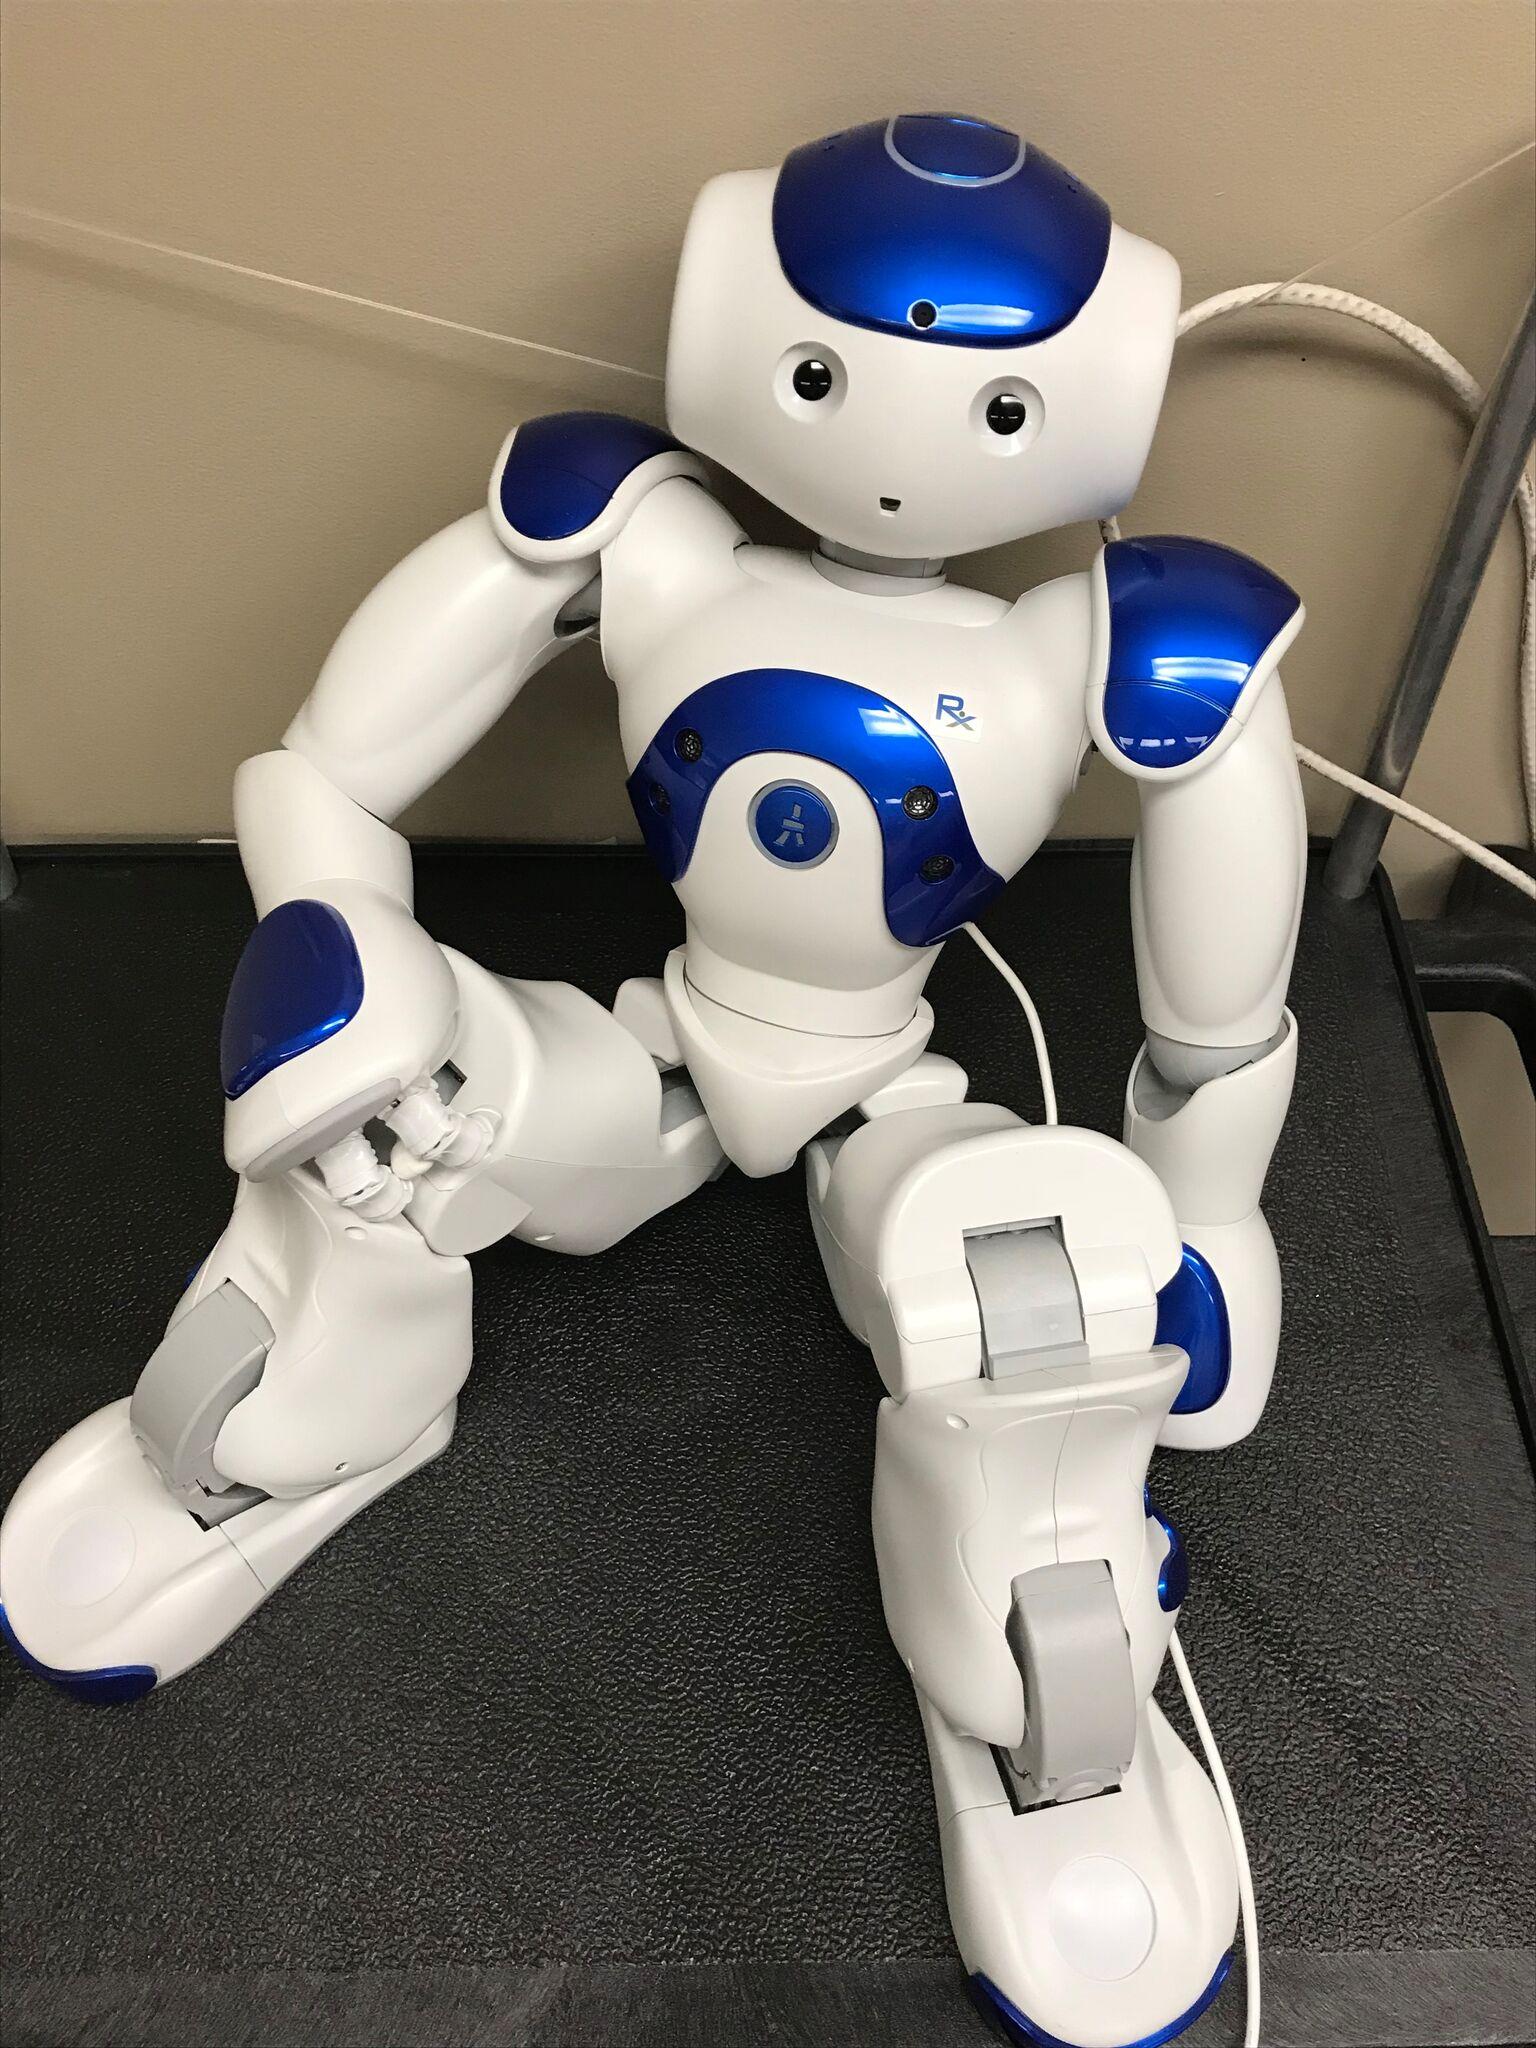 New Humanoid Robot at RUH to Help Children